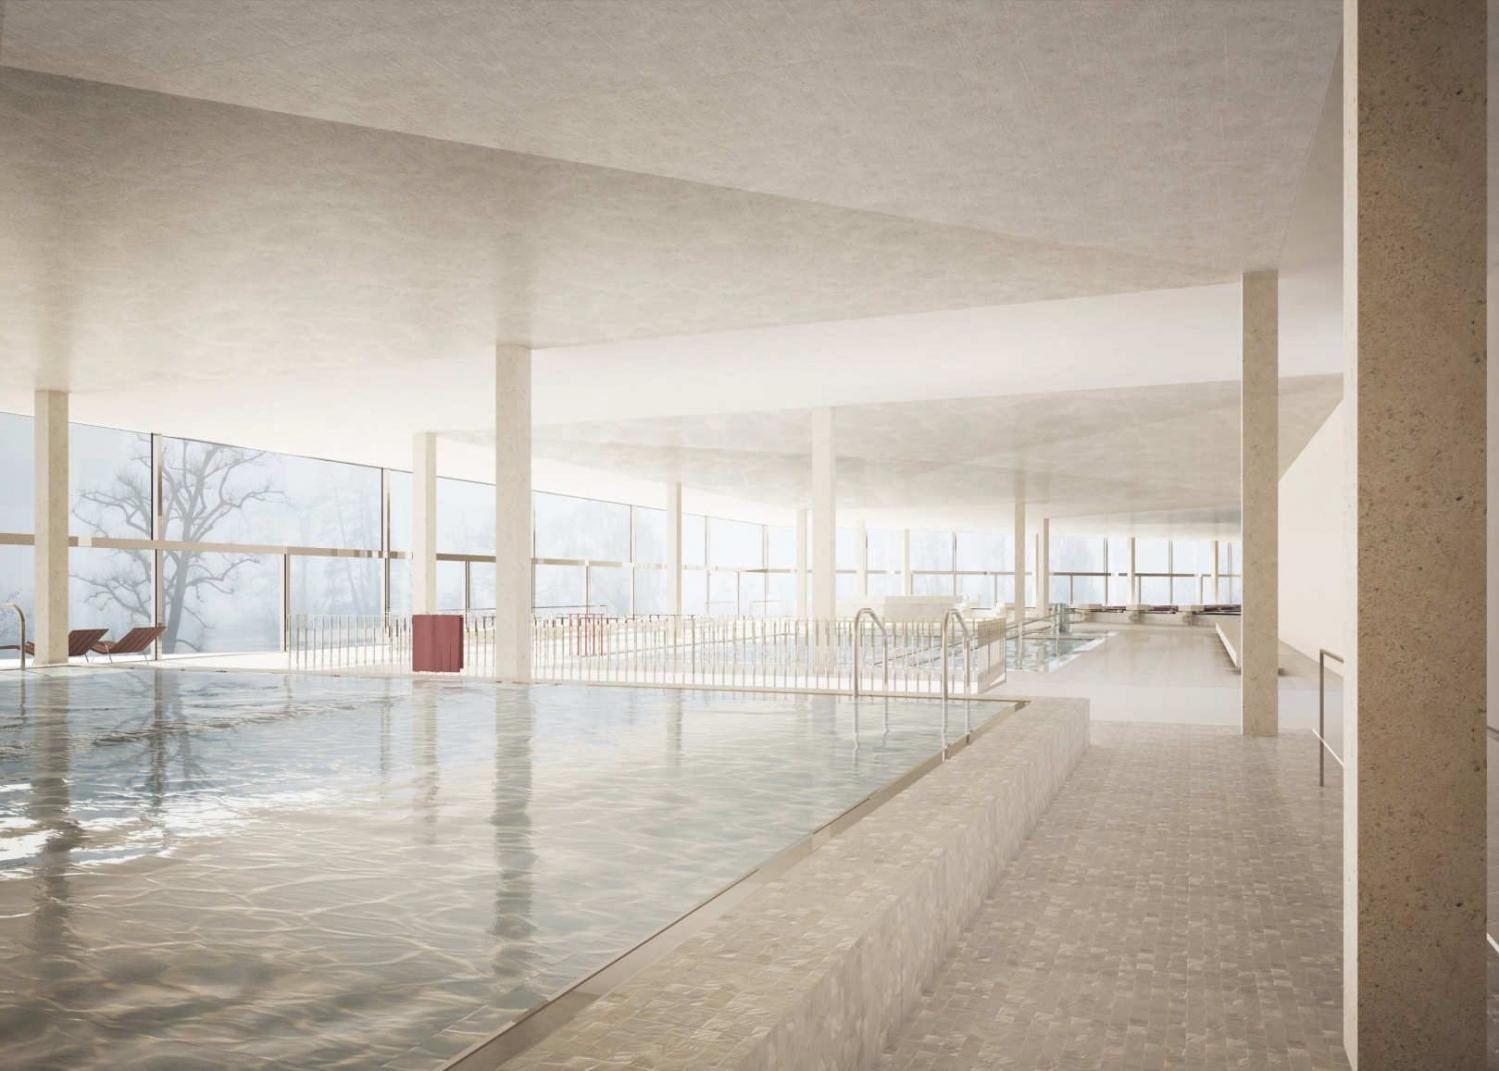 Joos-Mathys-.-Oberdorf-Indoor-swimming-pool-.-Dübendorf-3.jpg